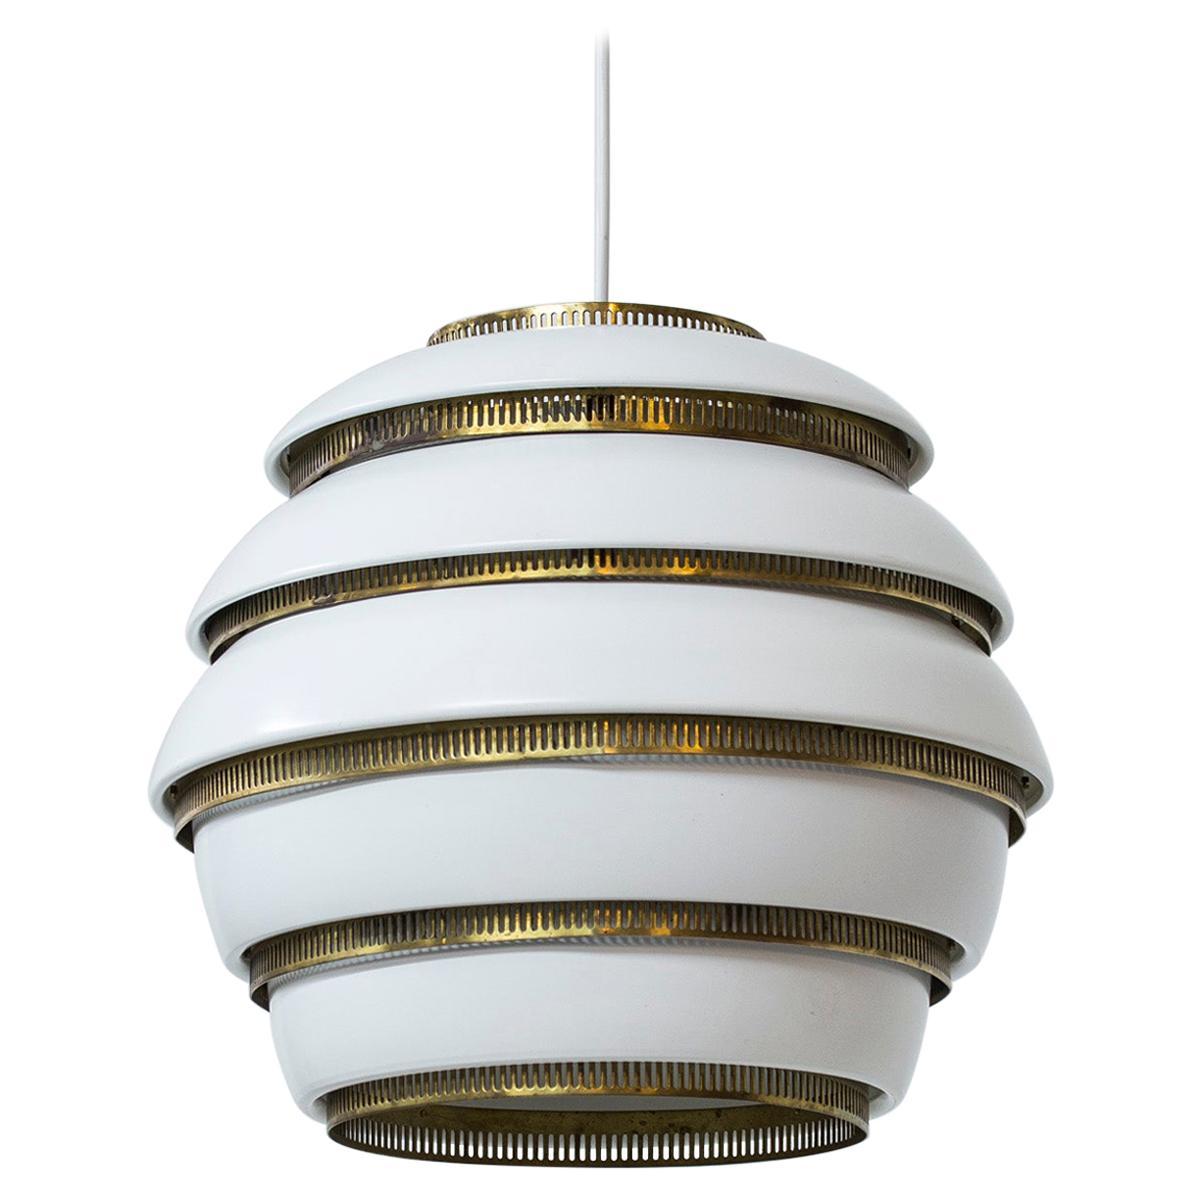 """Beehive"" Ceiling Lamp Model A331 by Alvar Aalto, Valaisinpaja OY, Finland 1960s"